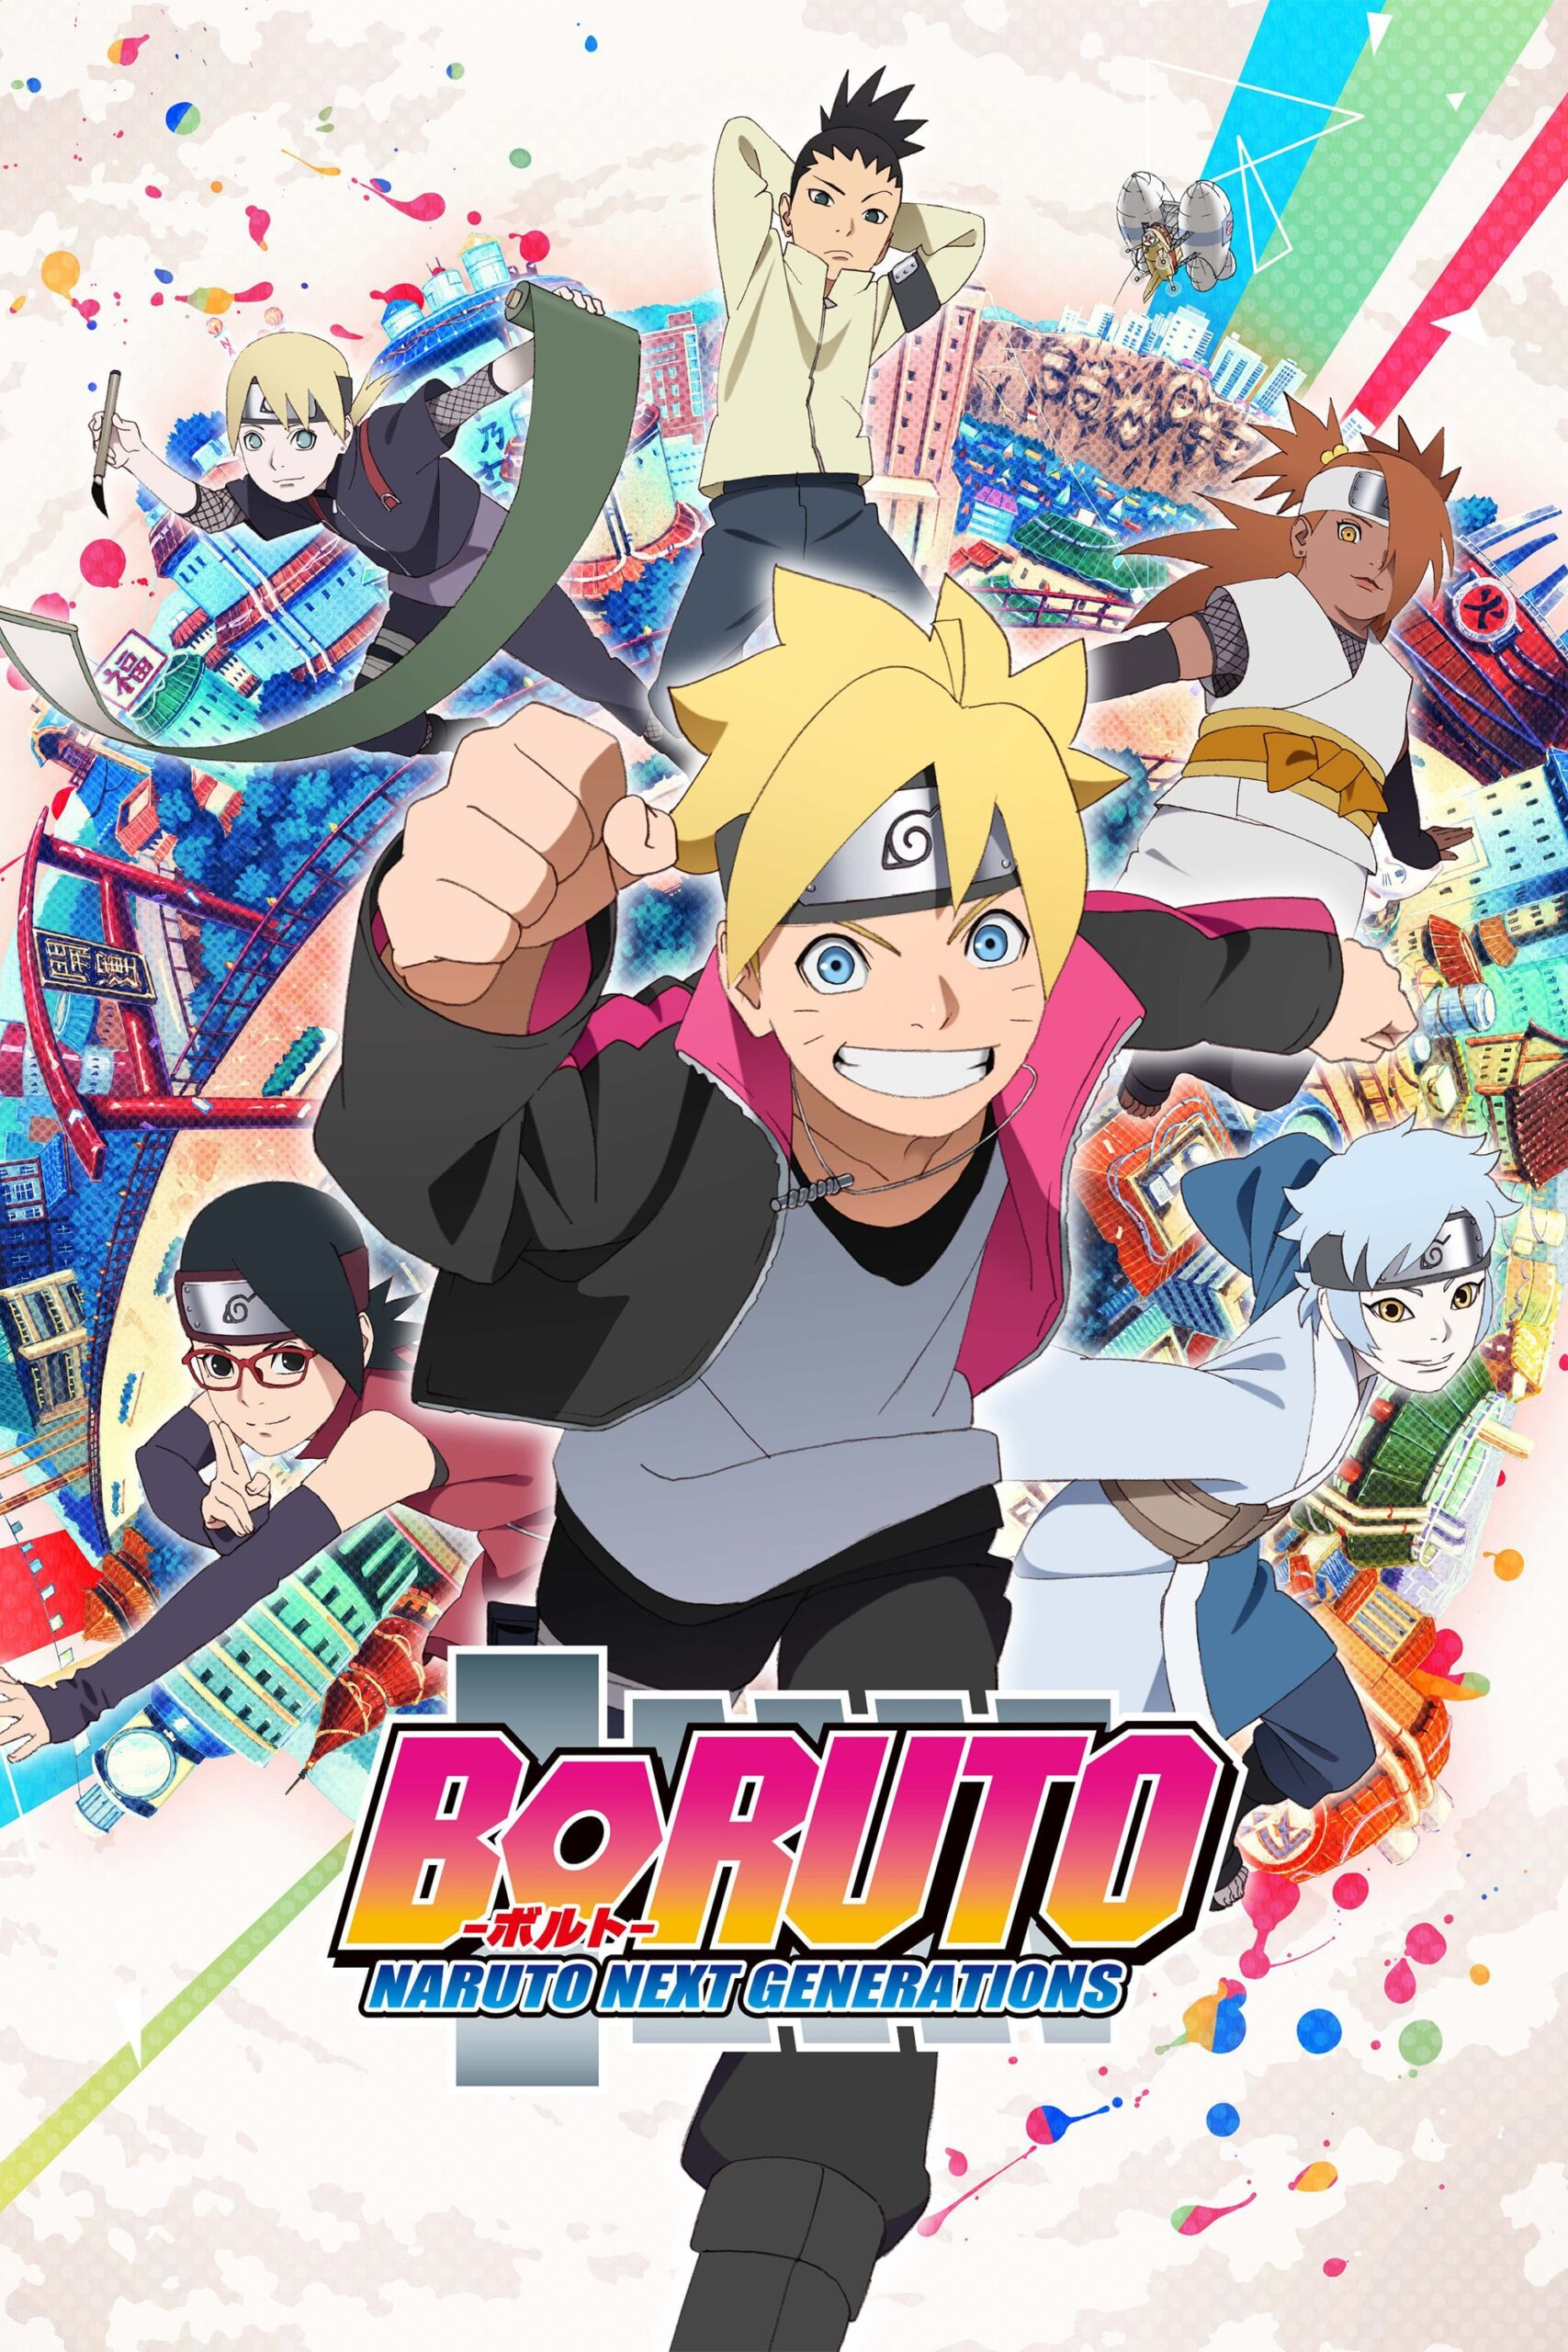 Naruto The Last Streaming : naruto, streaming, Boruto:, Naruto, Generations, Japanese, Series, Streaming, Online, Watch, Crunchyroll